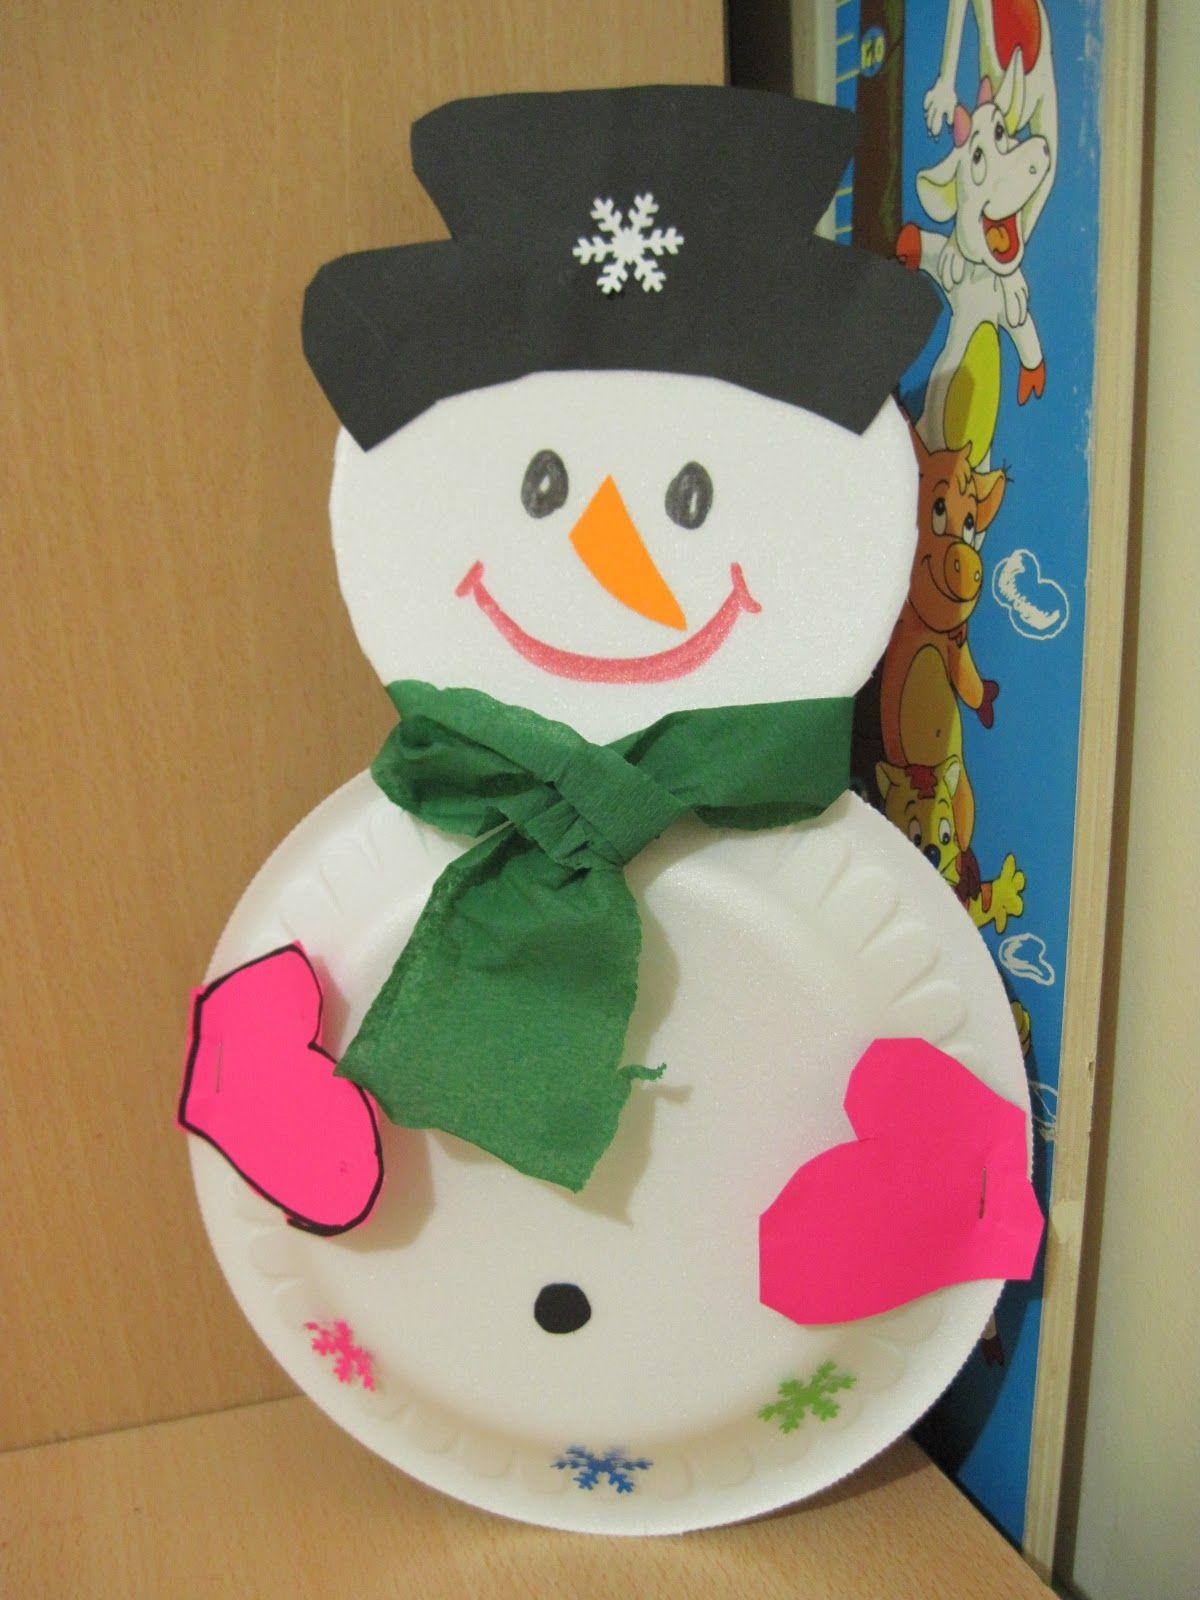 Paper Plate Snowman Craft Idea For Kids